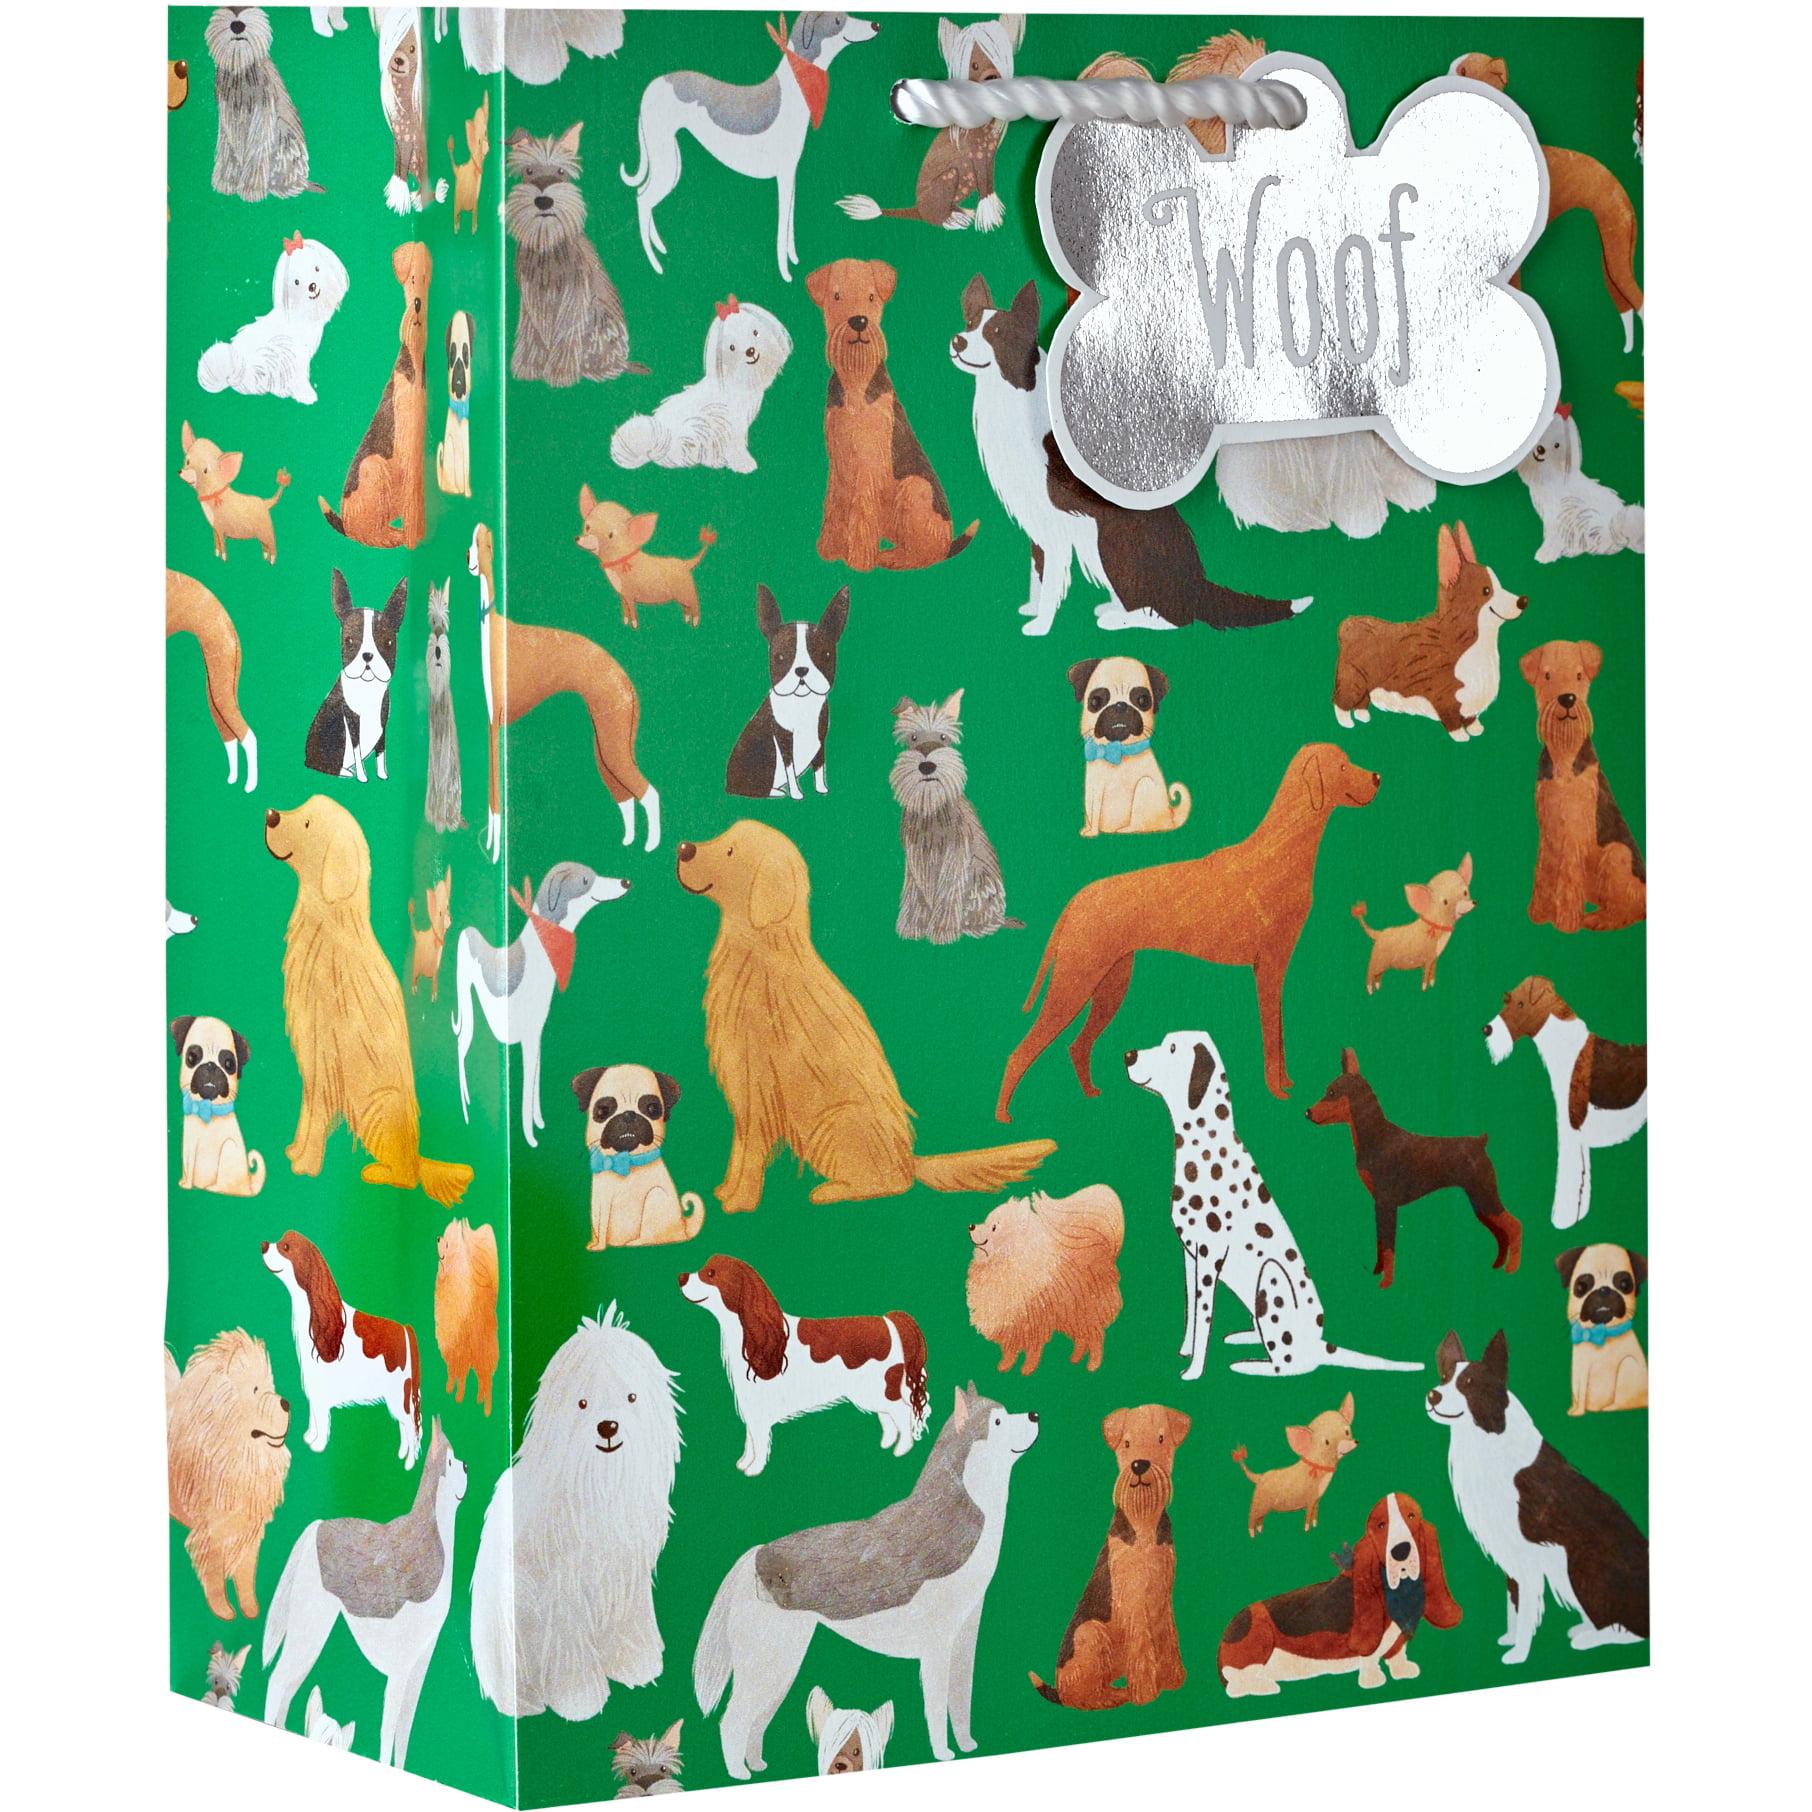 Jillson & Roberts Eco-Friendly Medium Gift Bags, Best in Show (12 Pcs)